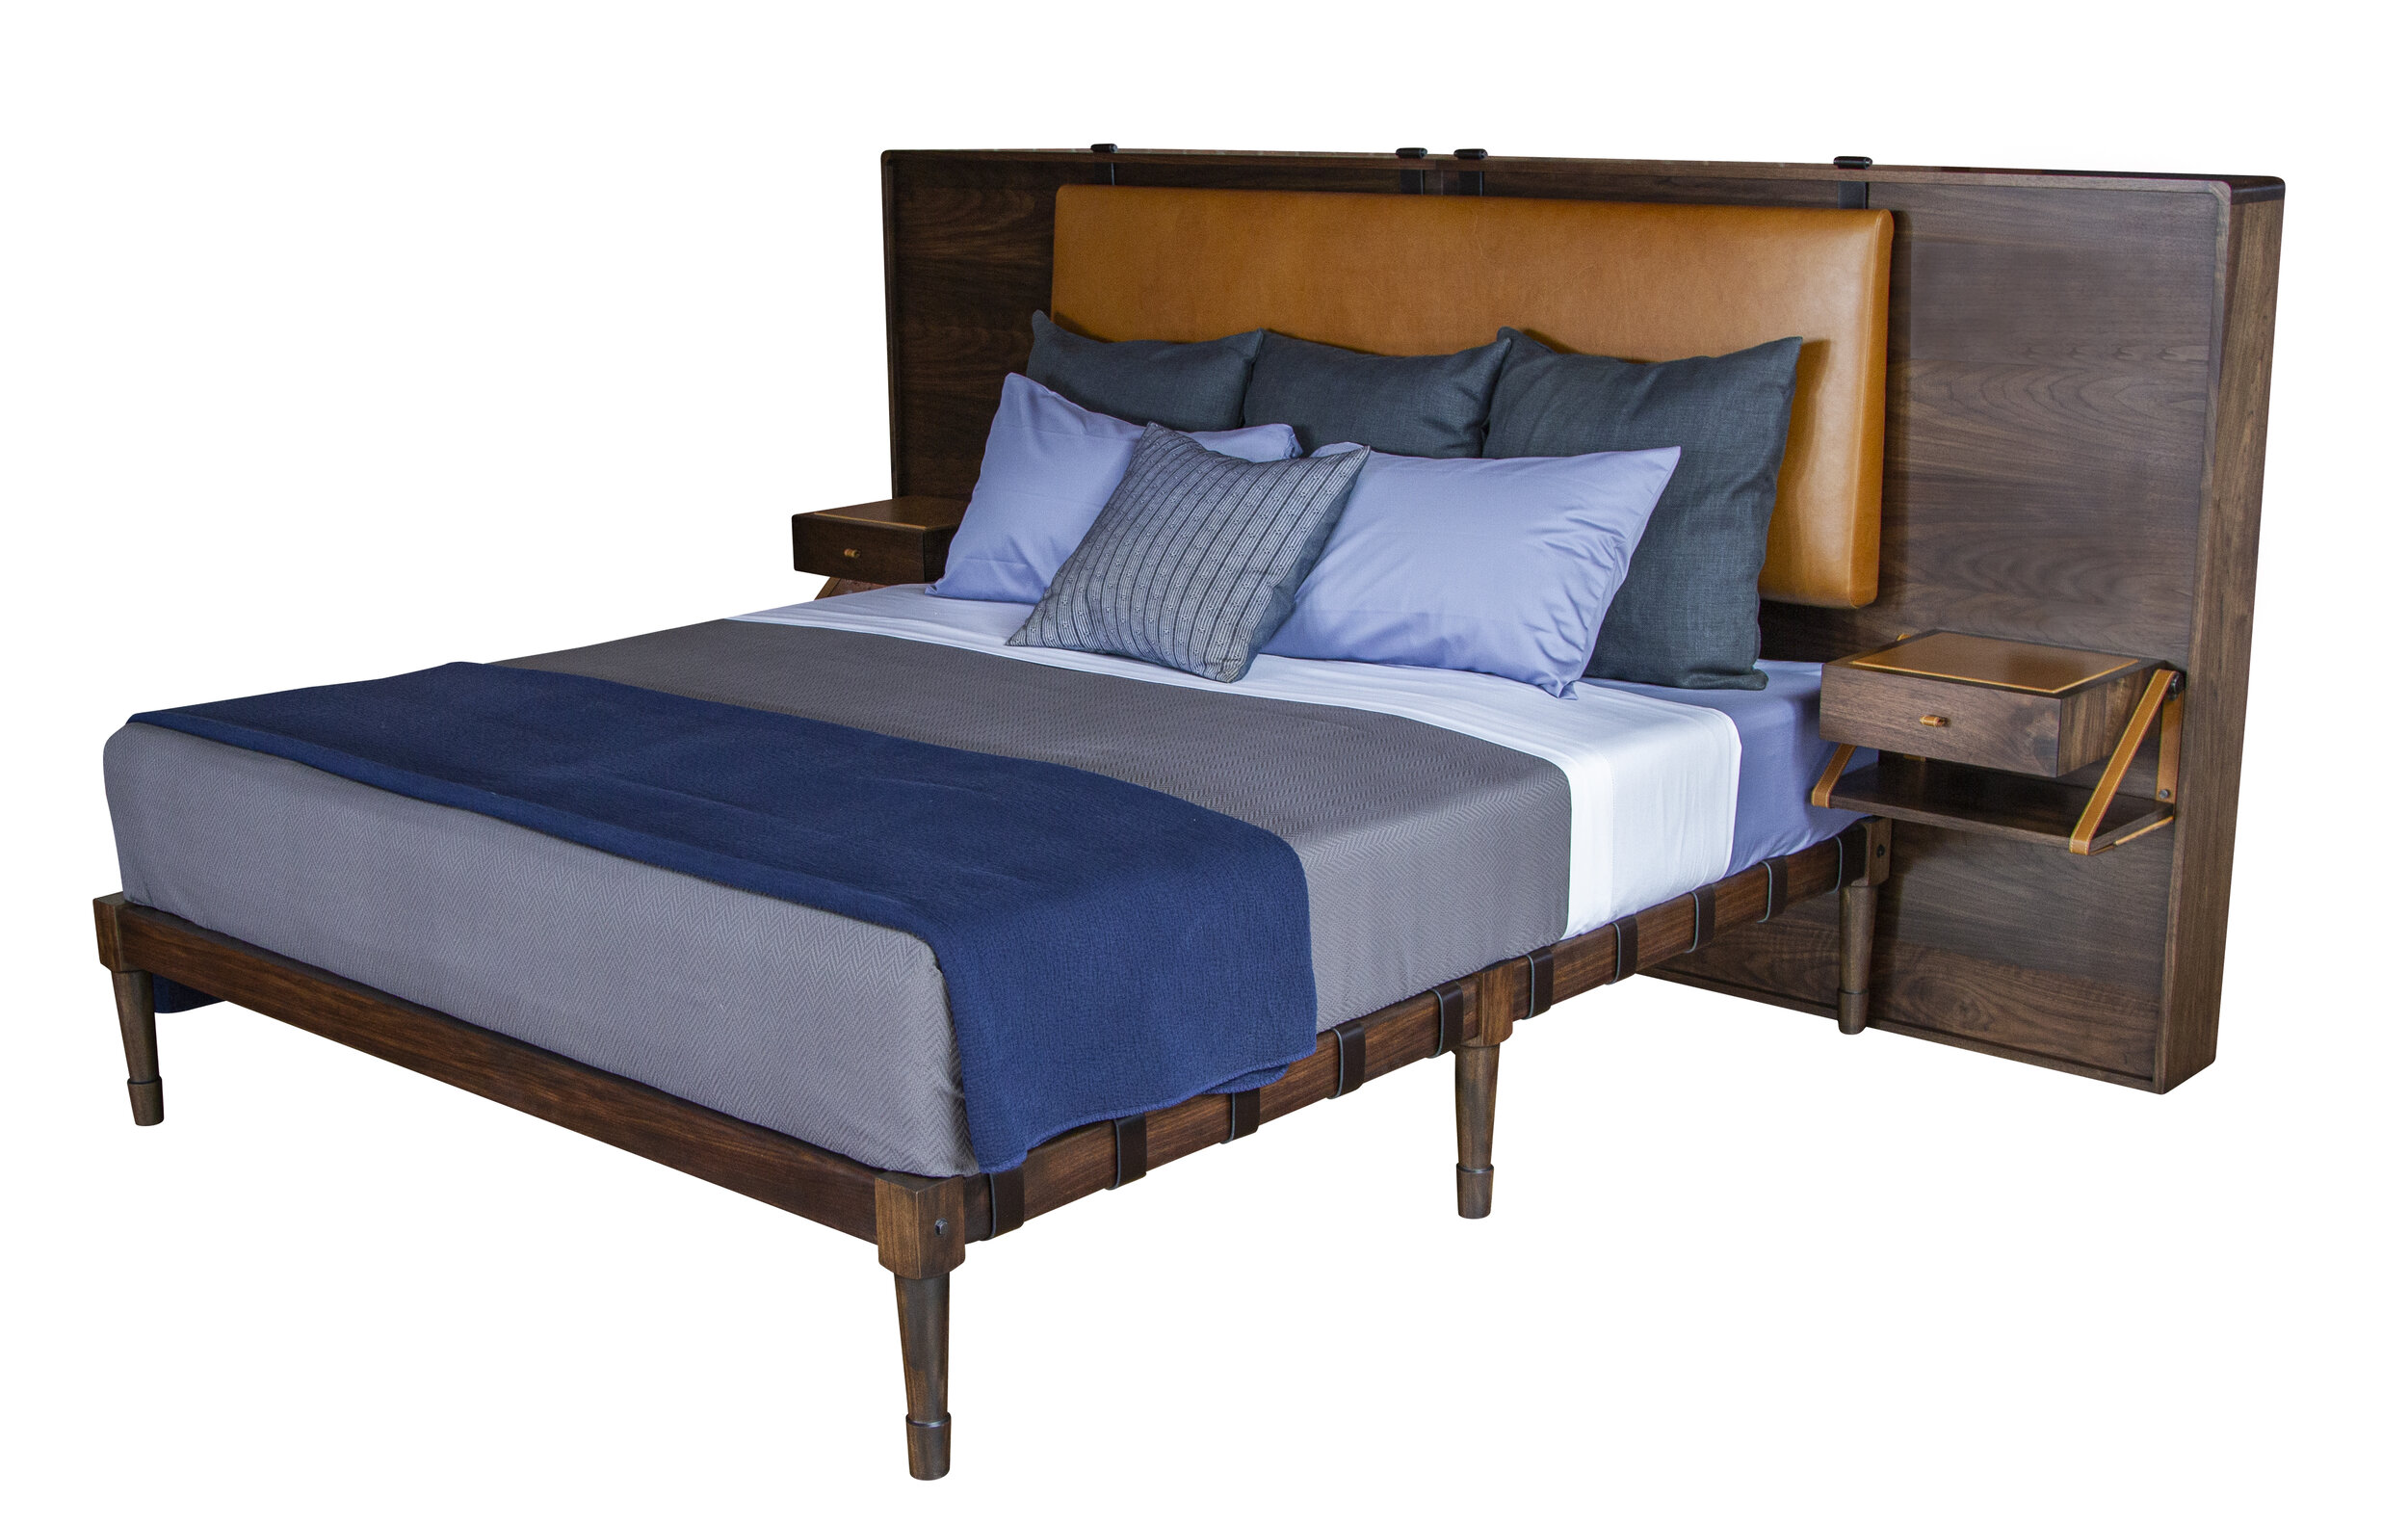 CA King Jasper Bed with the Marlton Headboard